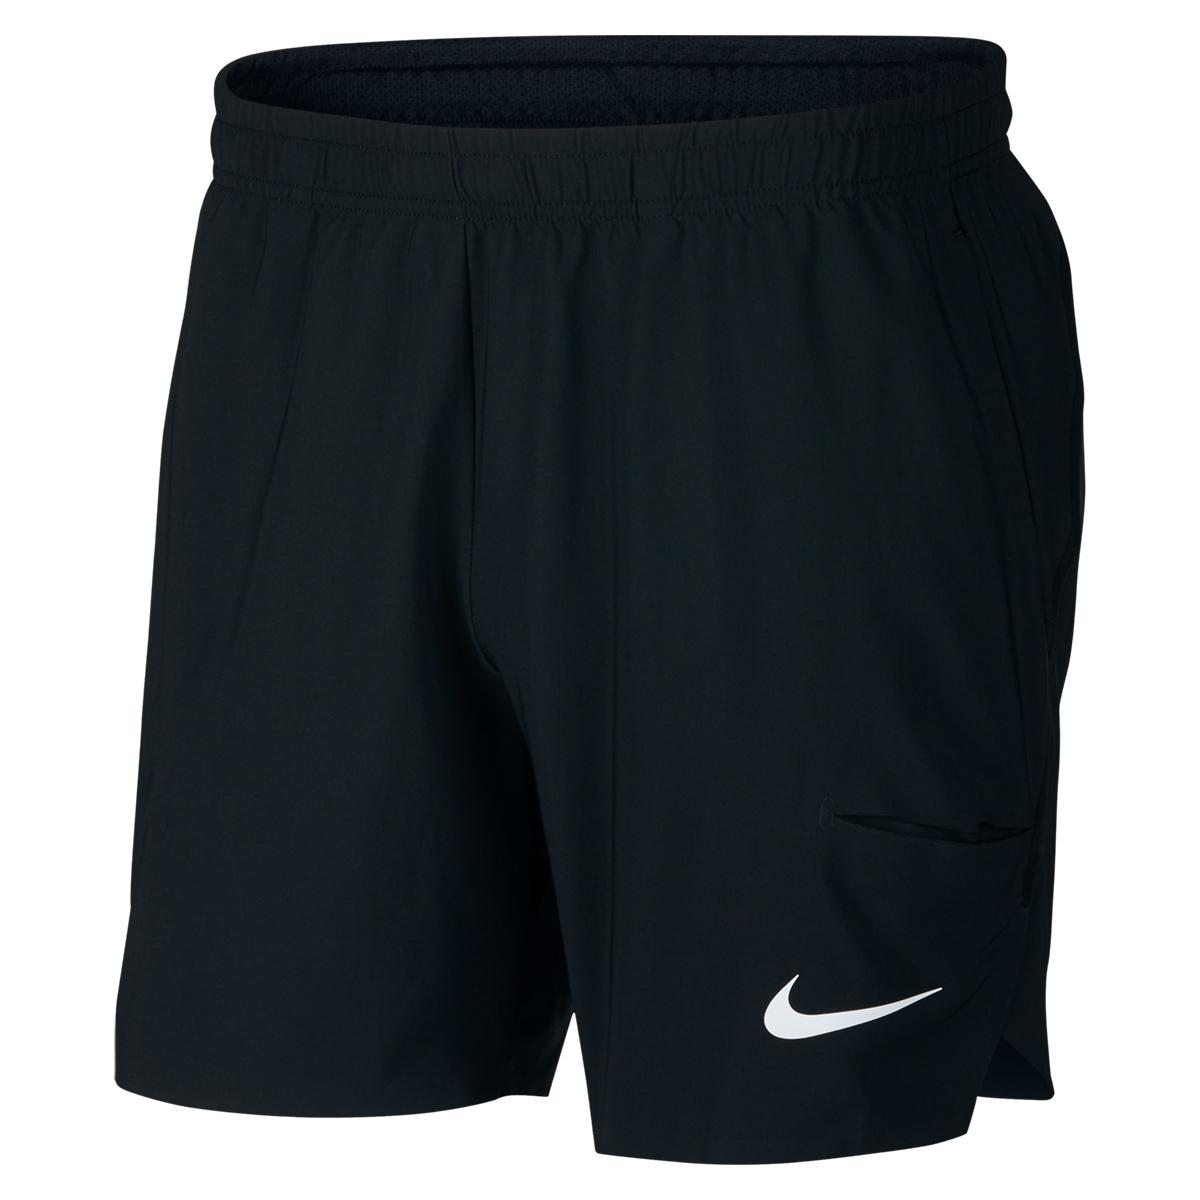 Roger Federer 2018 BNP Paribas Open Indian Wells Short Black - Roger Federer 2018 Indian Wells Nike Outfit